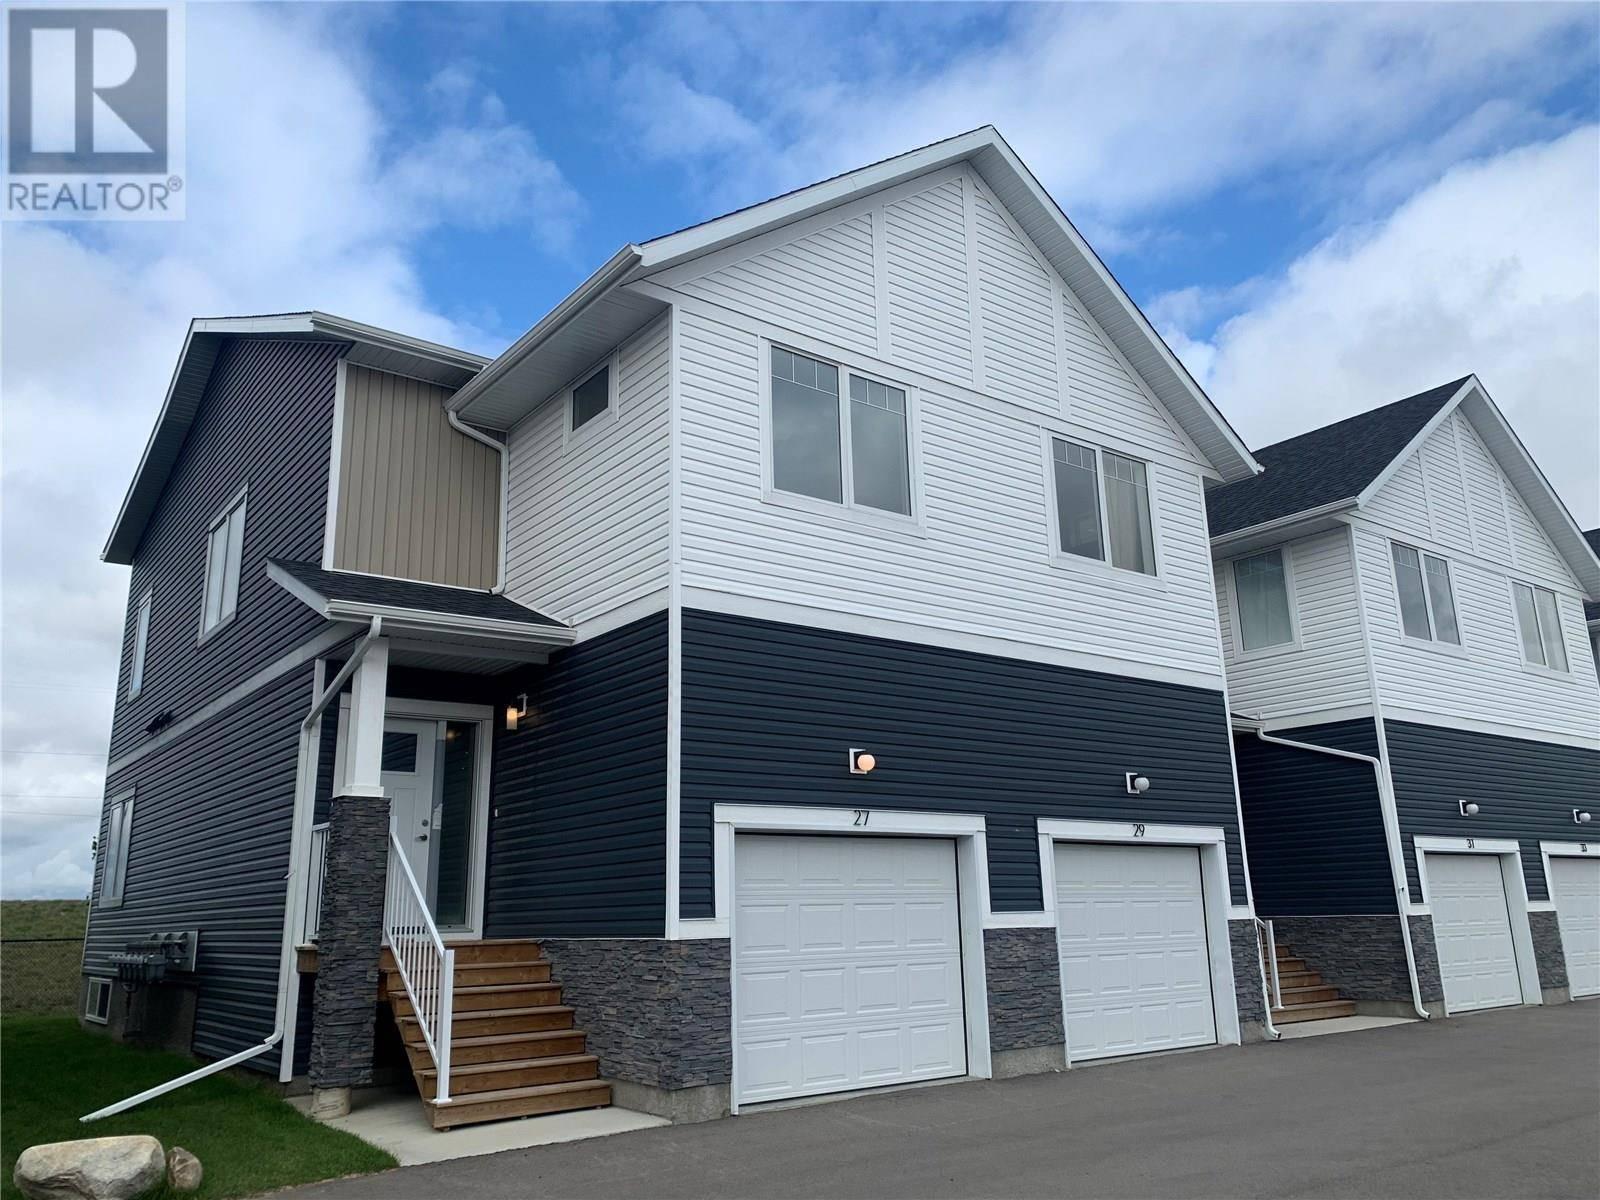 Townhouse for sale at 510 Kloppenburg Cres Unit 27 Saskatoon Saskatchewan - MLS: SK786109